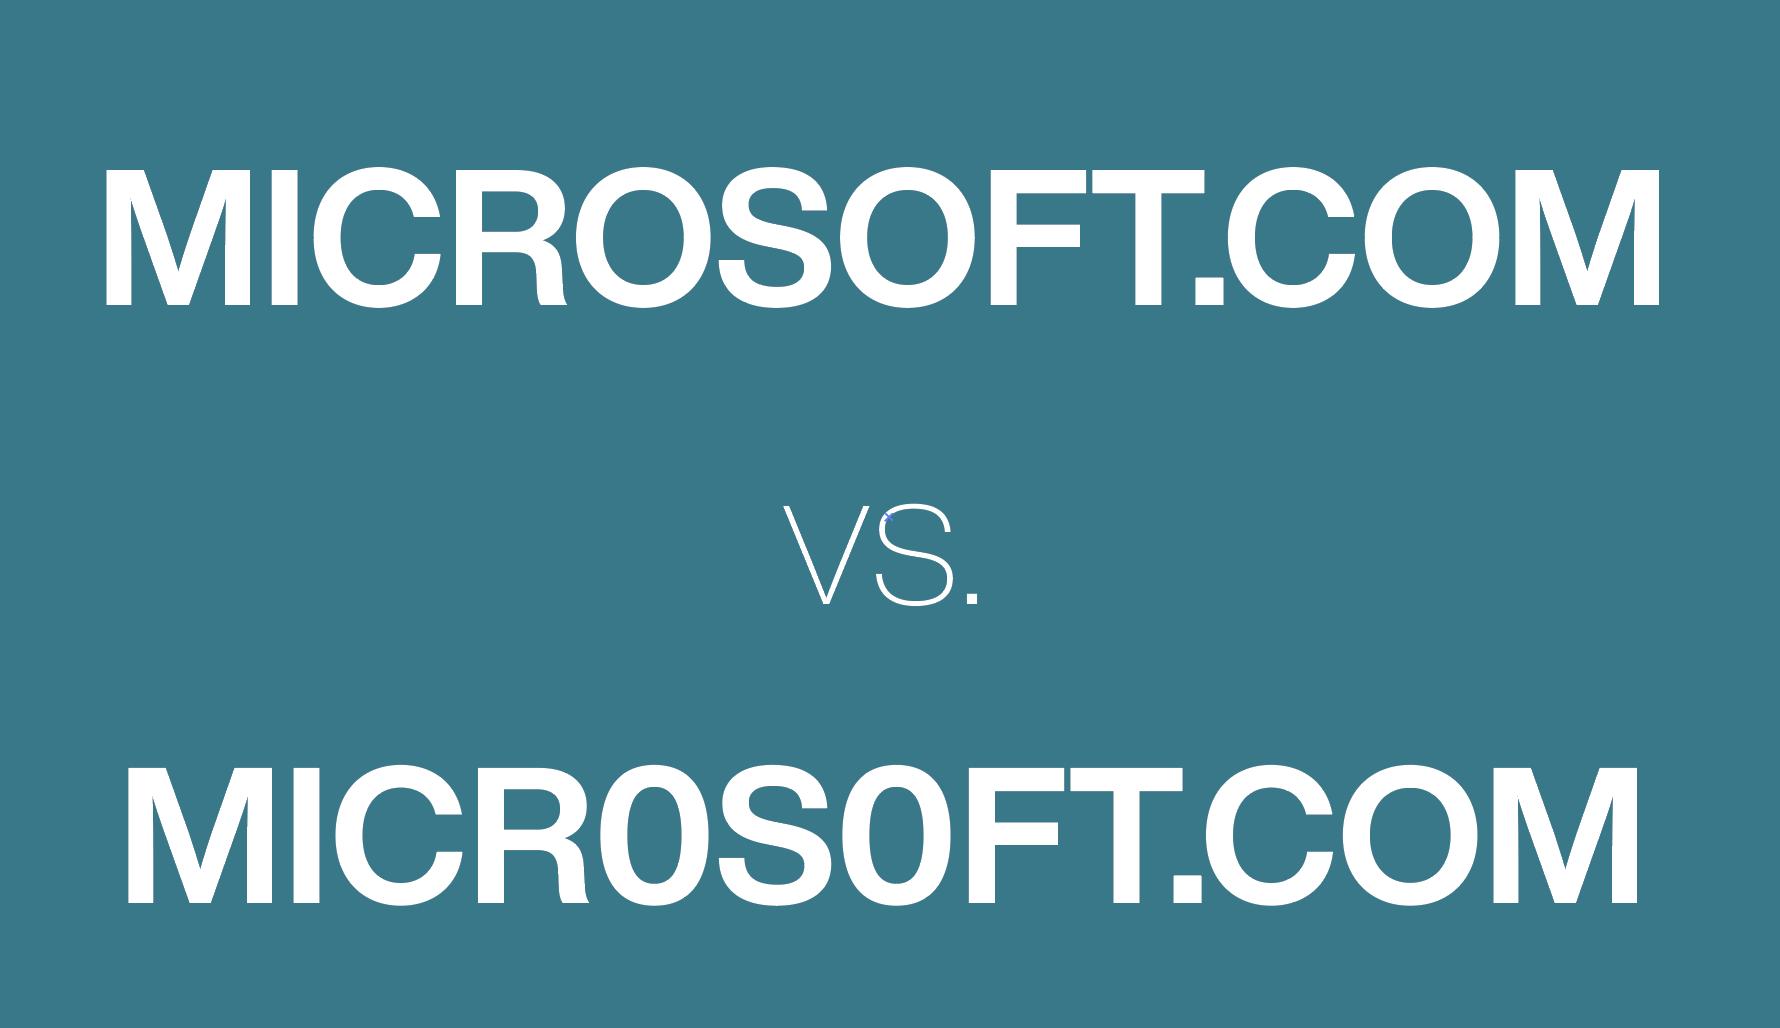 MICROSOFT.COM vs. MICR0S0FT.COM